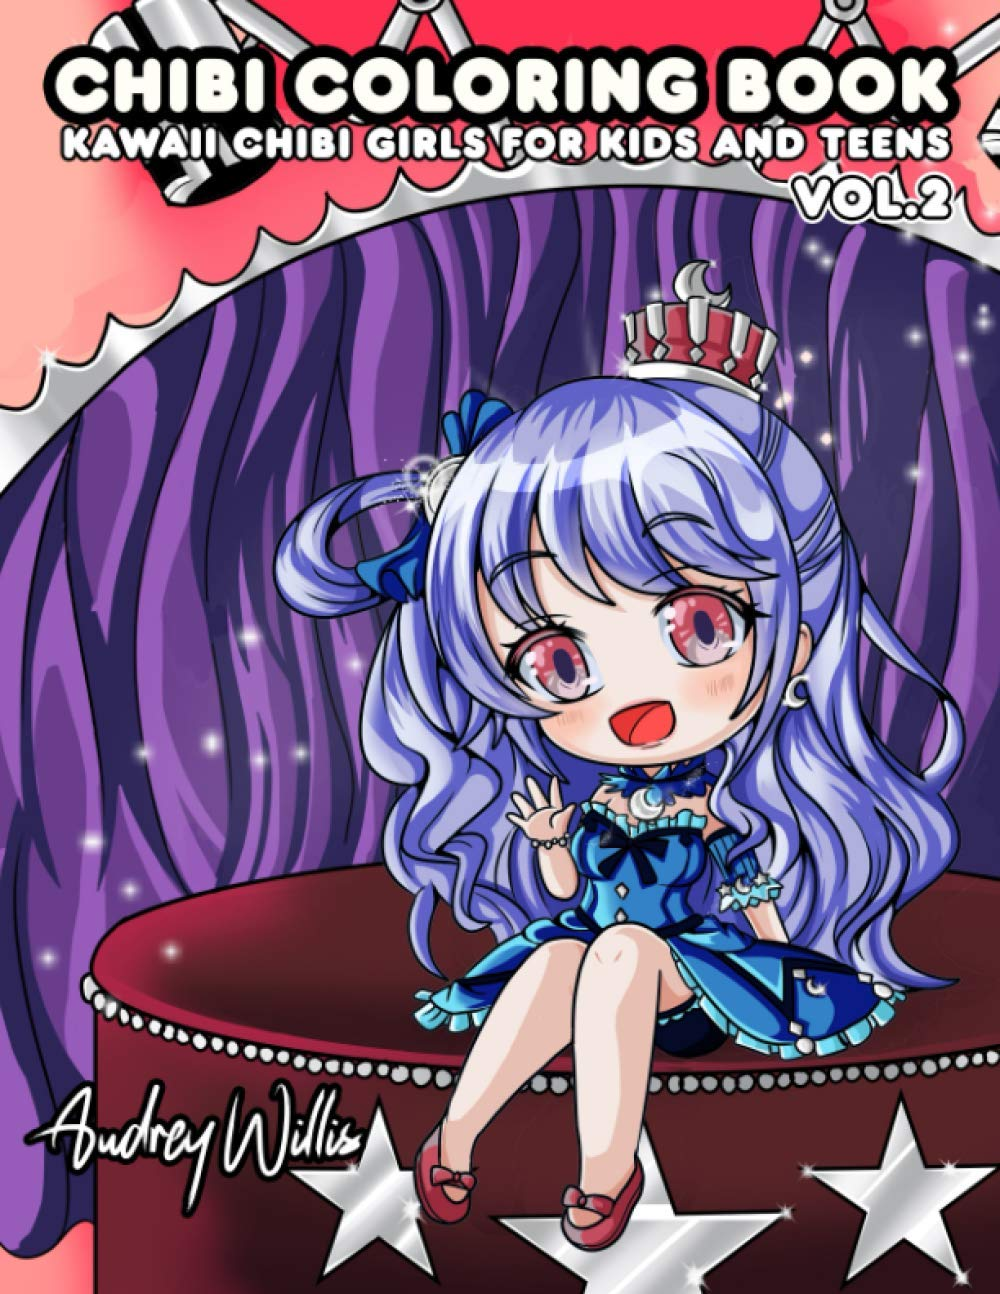 Chibi Coloring Book Kawaii Chibi Girls And Super Cute Anime Manga Characters Coloring Page For Kids And Teenagers Vol 2 Willis Audrey Print Joyful 9798709937000 Amazon Com Books